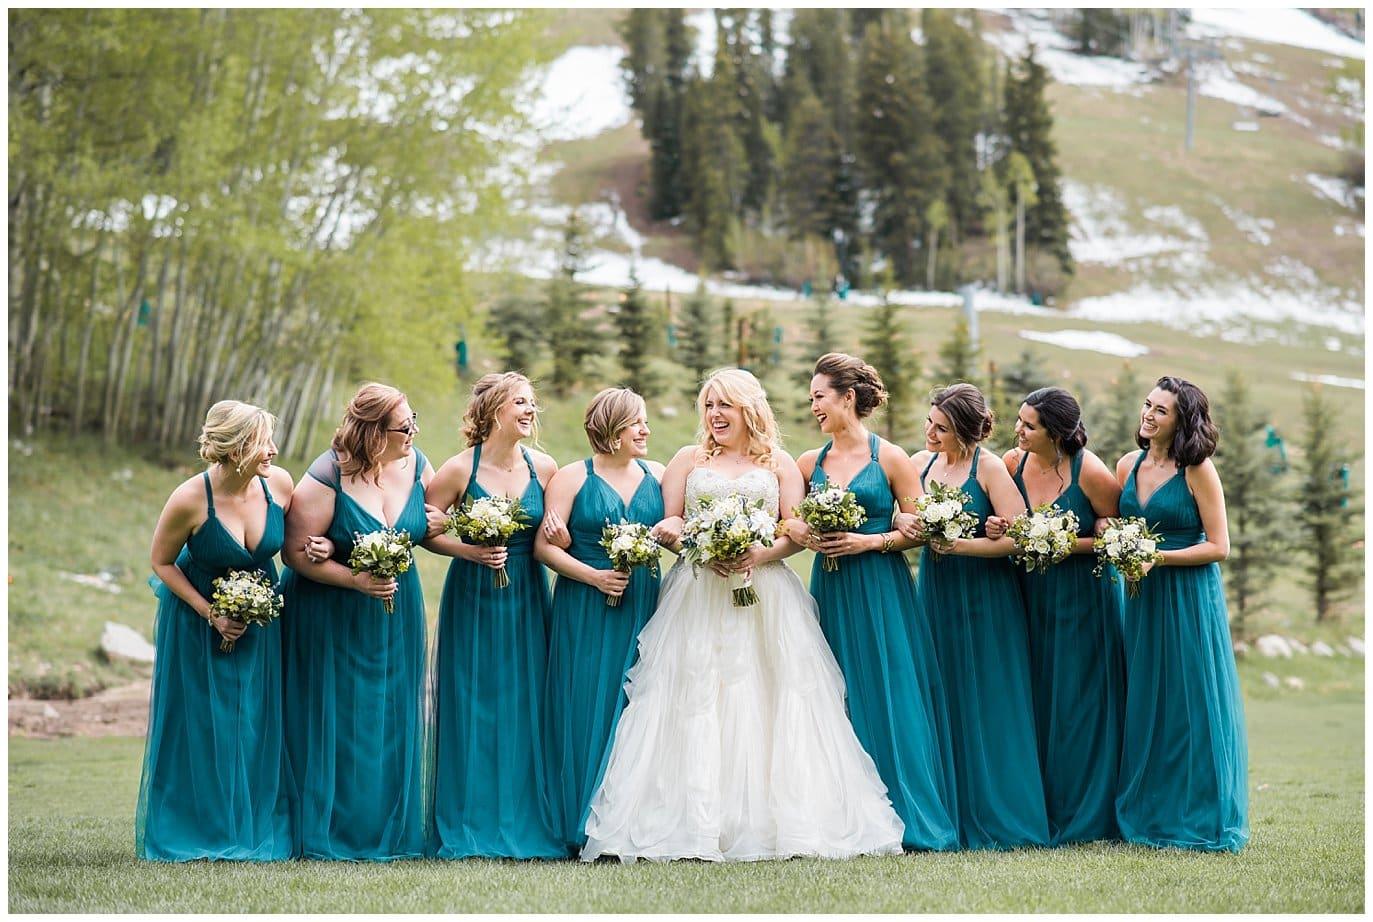 bridesmaids in teal bridesmaids dresses Beaver Creek wedding photo